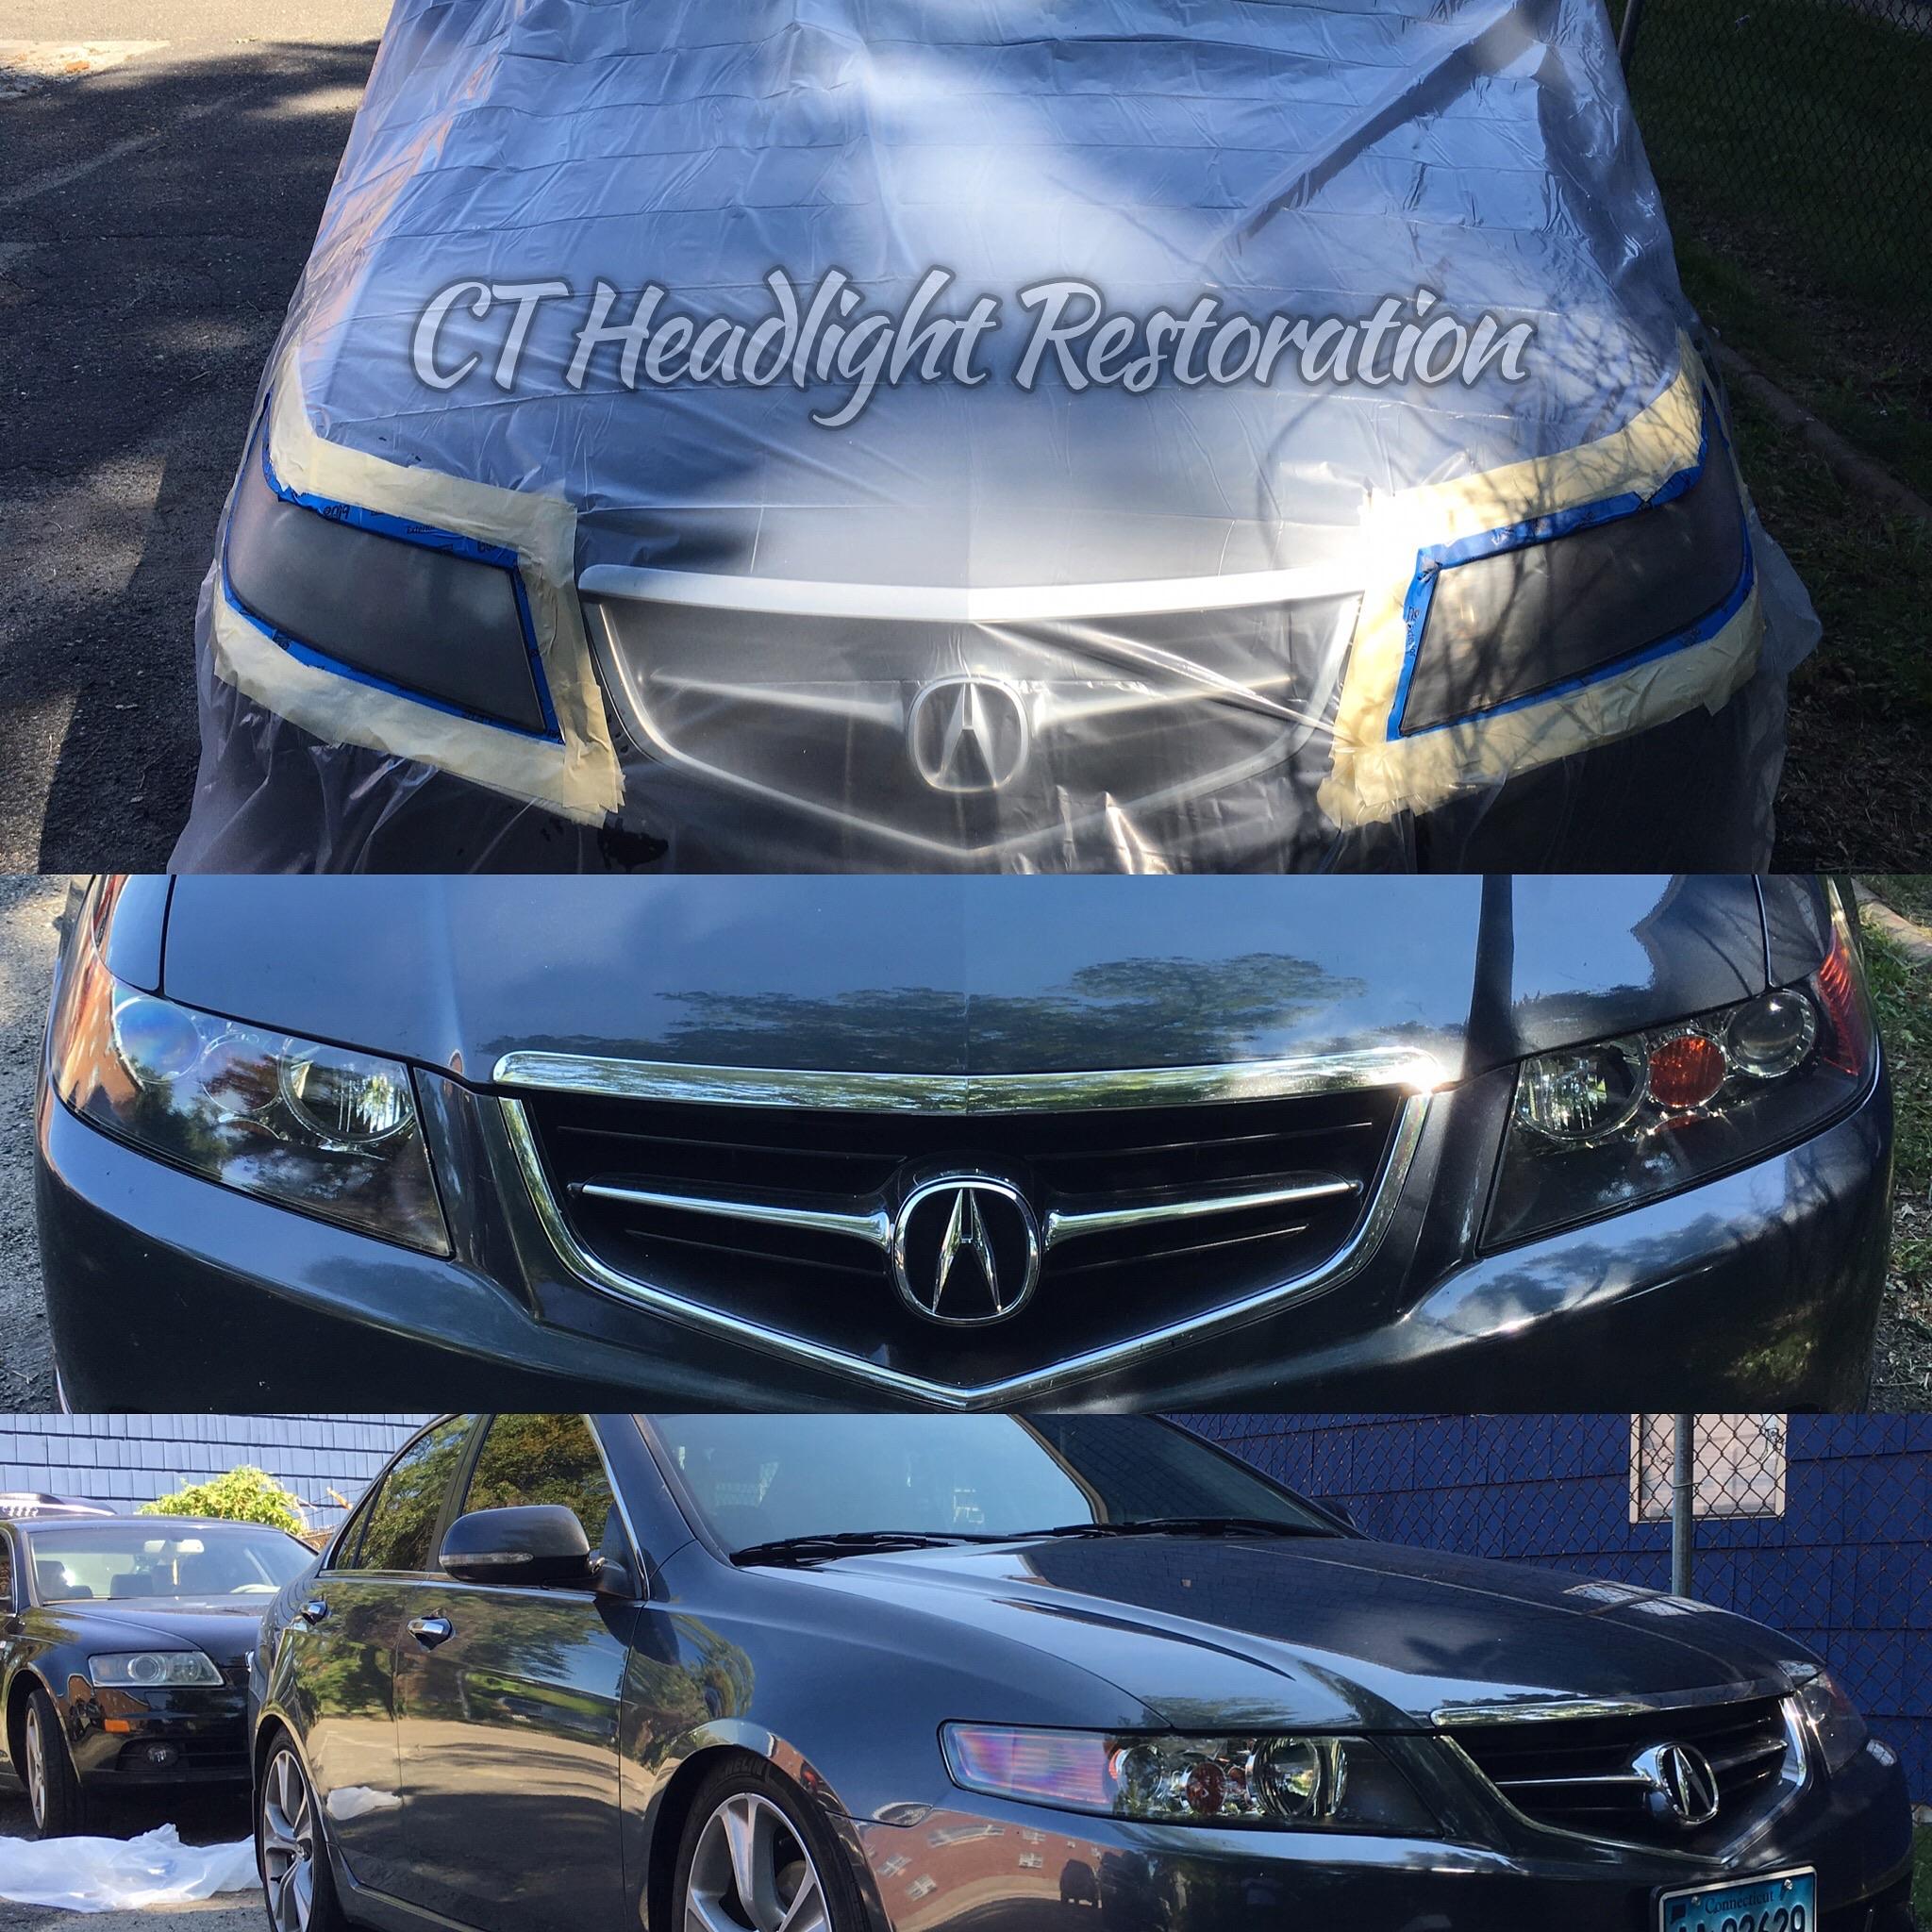 Acura Tsx Connecticut Headlight Restoration